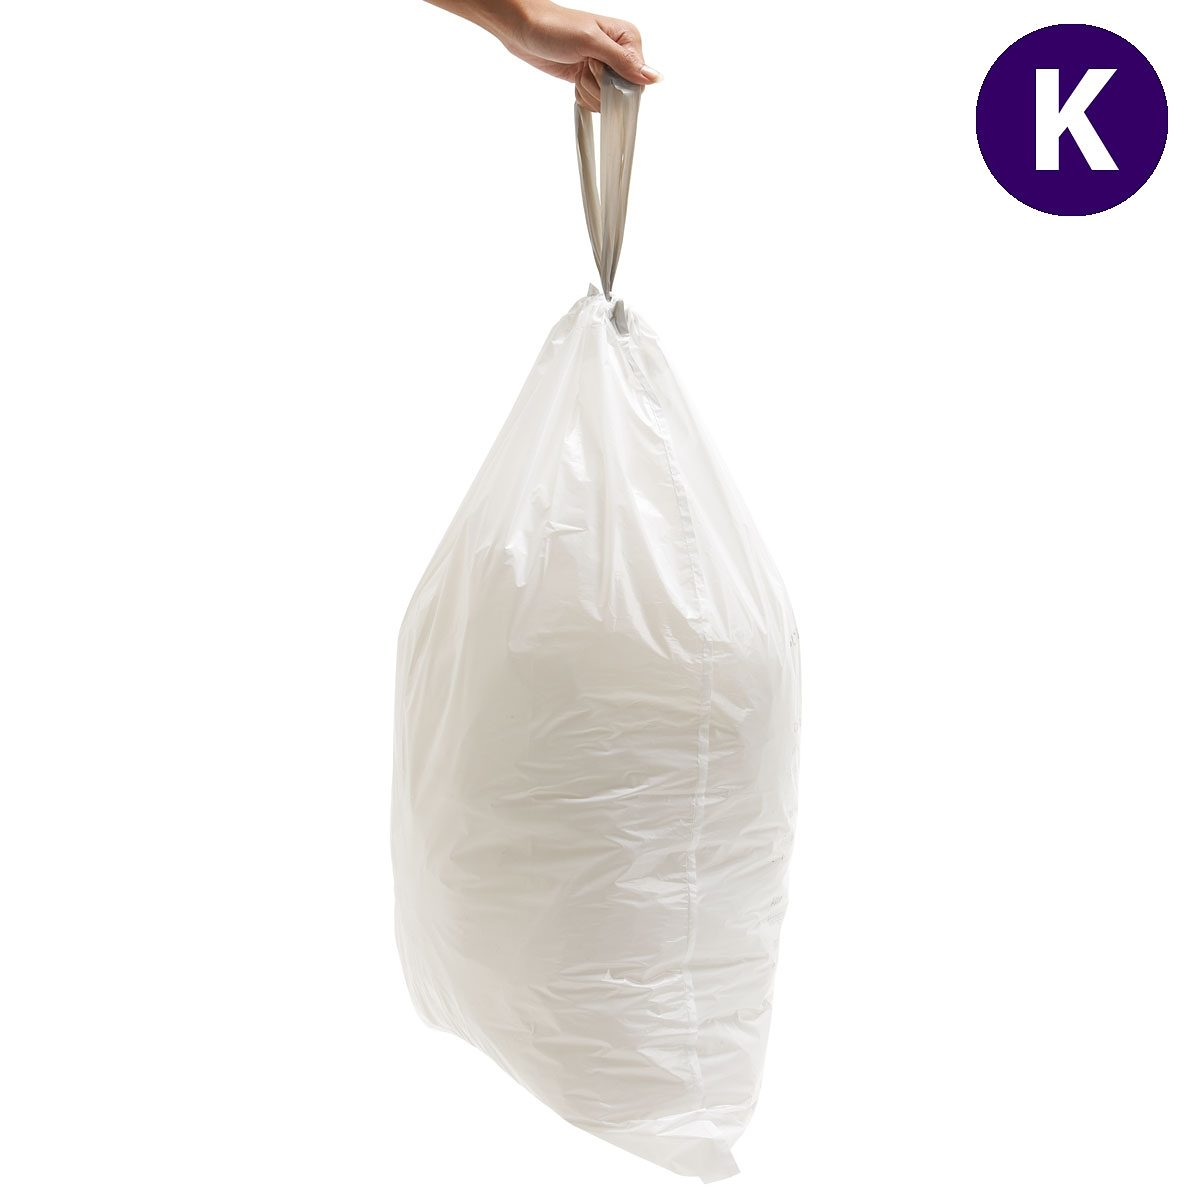 SIMPLEHUMAN simplehuman 20 Abfallbeutel Müllbeutel K 38 l